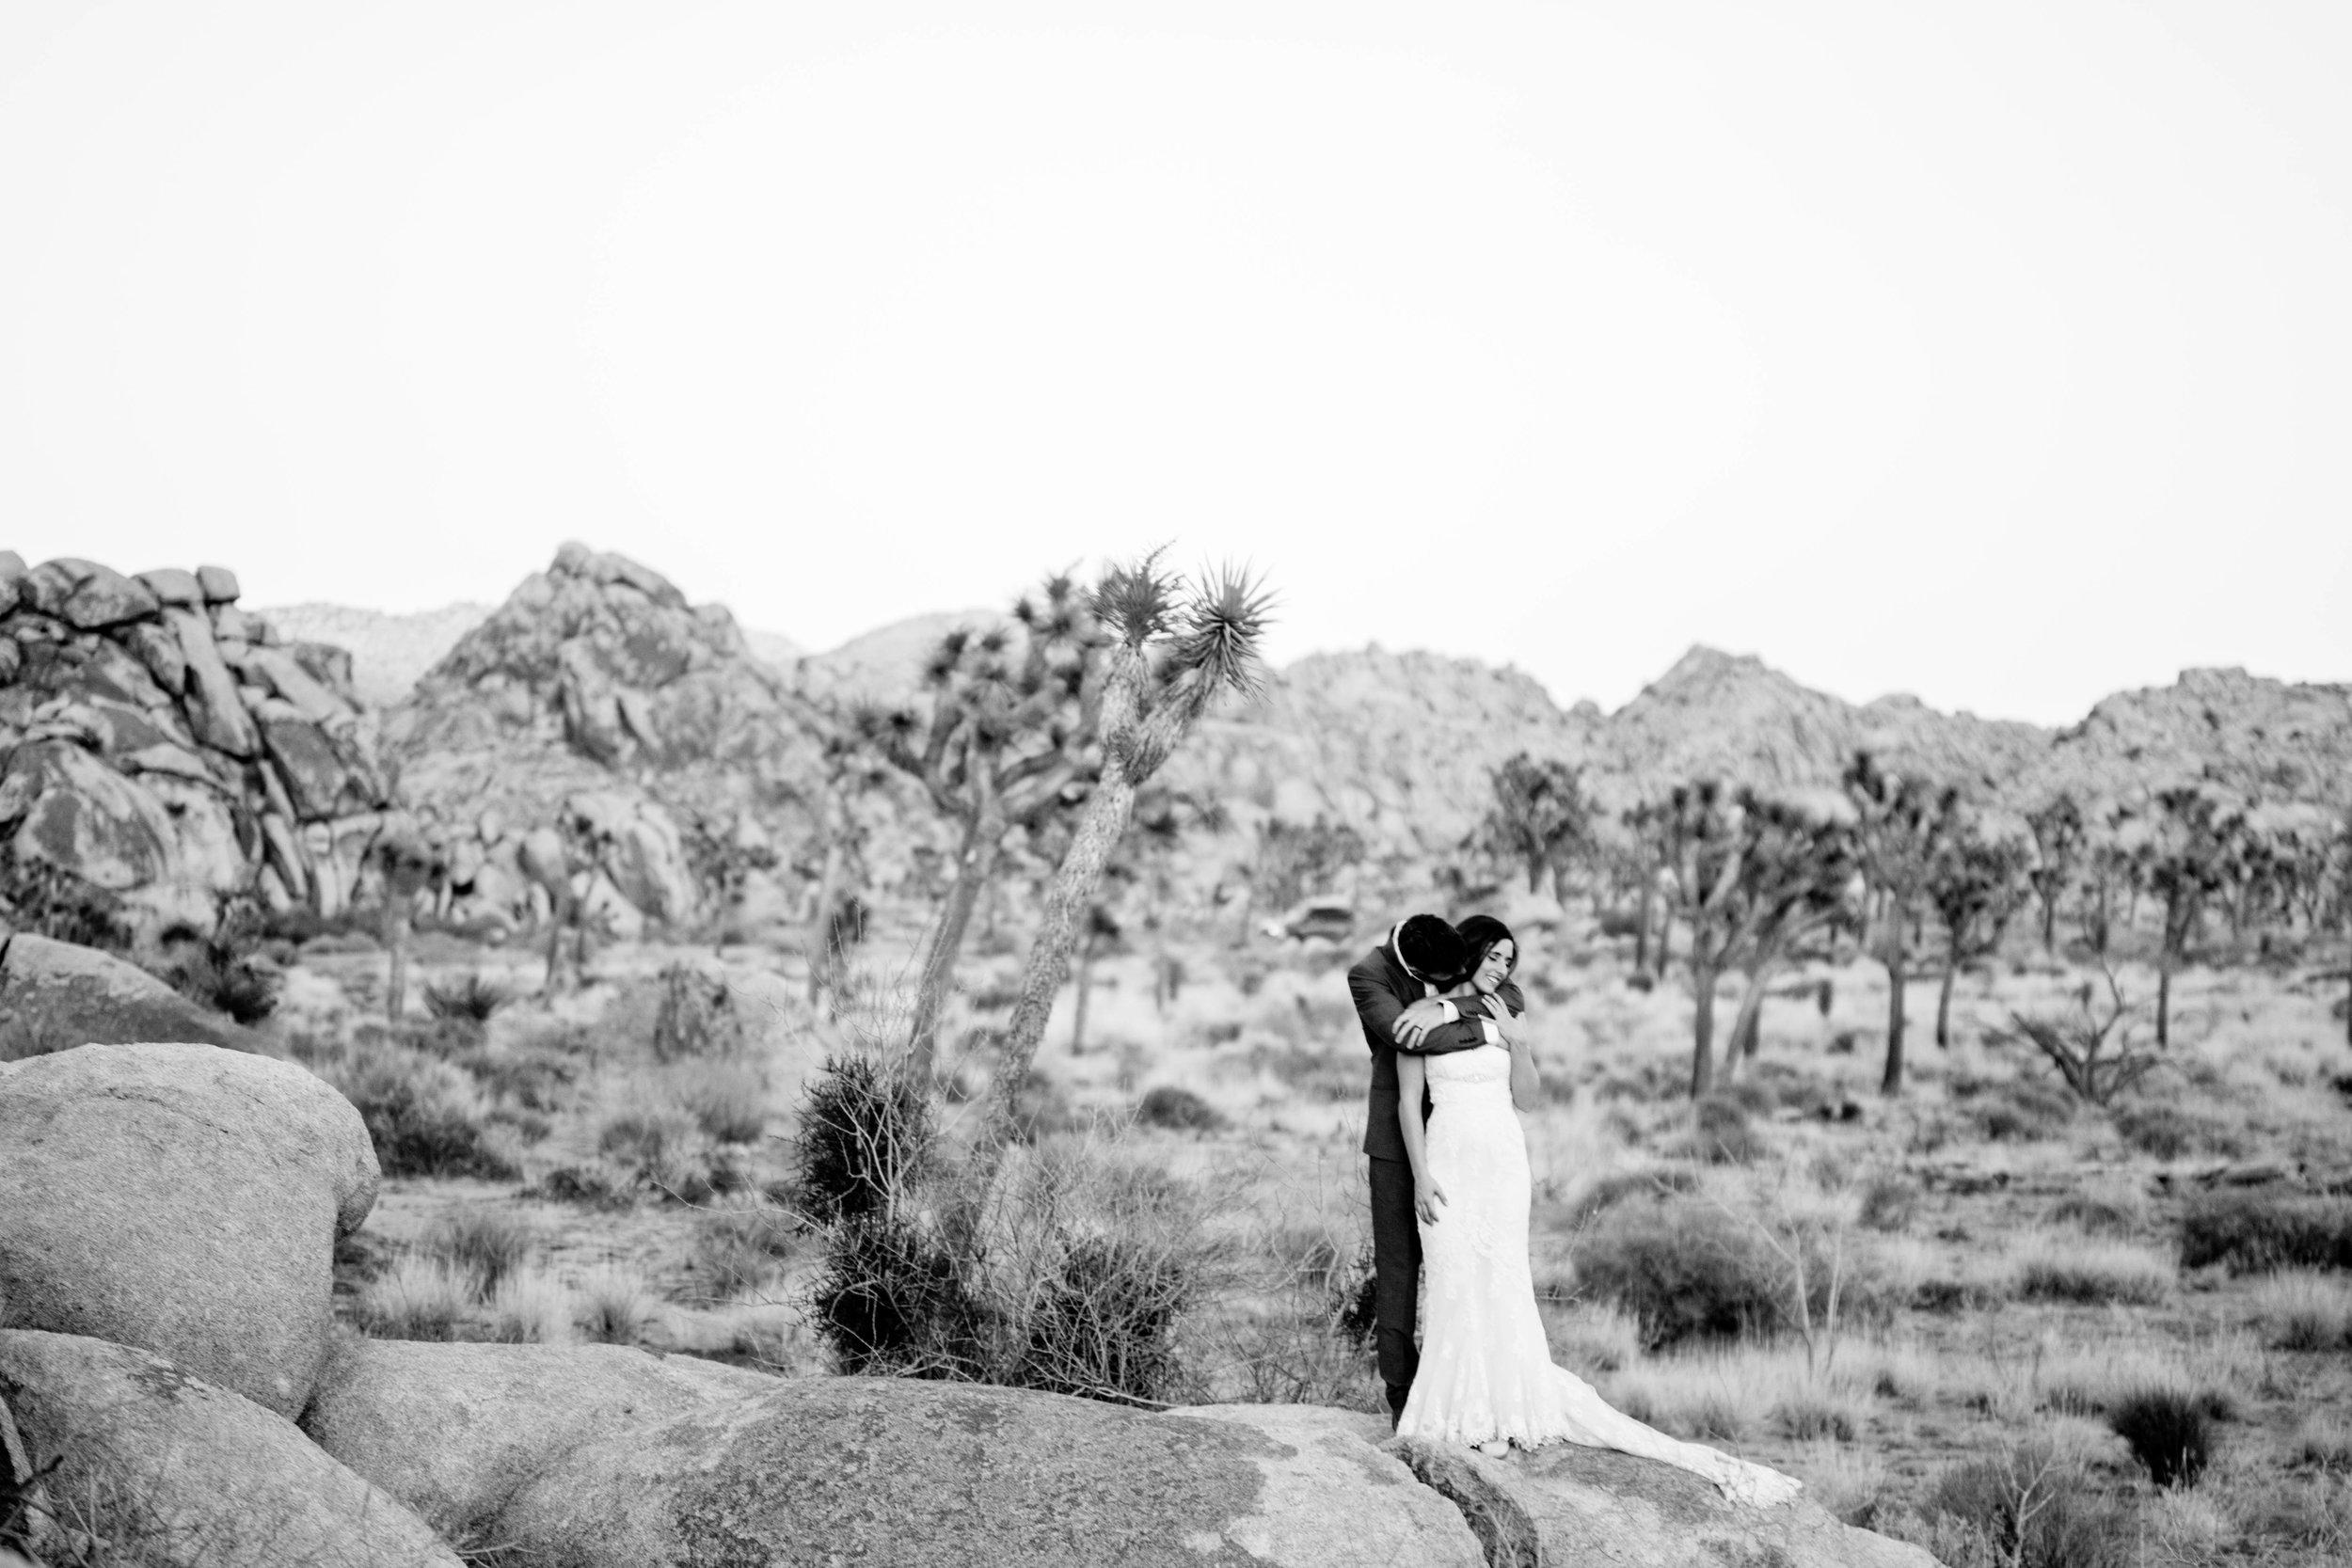 nicole-daacke-photography-joshua-tree-adventurous-elopement-wedding-national-park-wedding-photographer-adventure-wedding-adventurous-elopement-jtree-joshua-tree-national-park-wedding-photographer-intimate-weddings-golden-desert-love-36.jpg